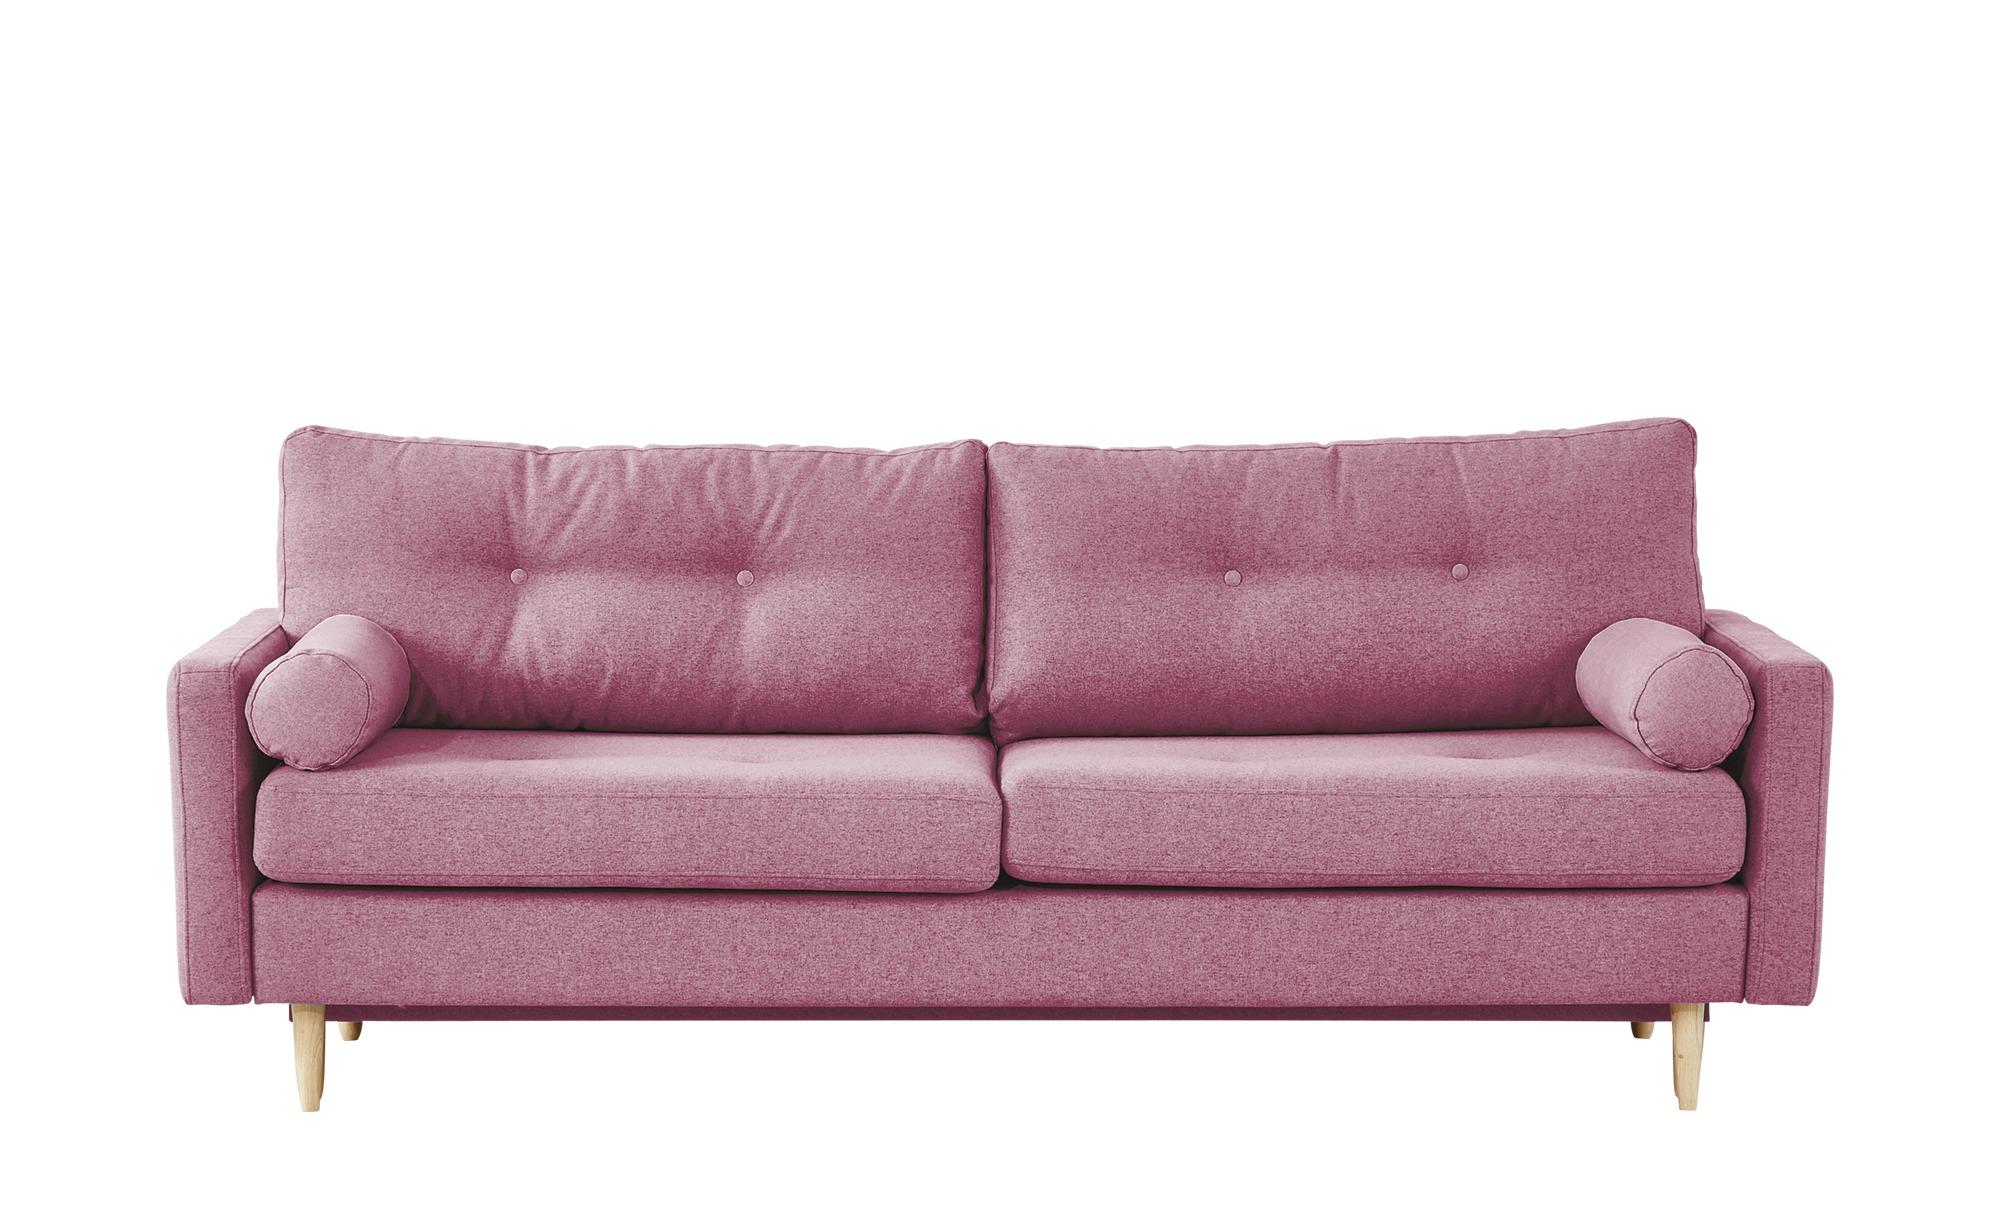 finya Design-Schlafsofa 3-sitzig rosa - Webstoff Pure ¦ rosa/pink ¦ Maße (cm): B: 218 H: 85 T: 93 Polstermöbel > Sofas > 3-Sitzer - Höffner